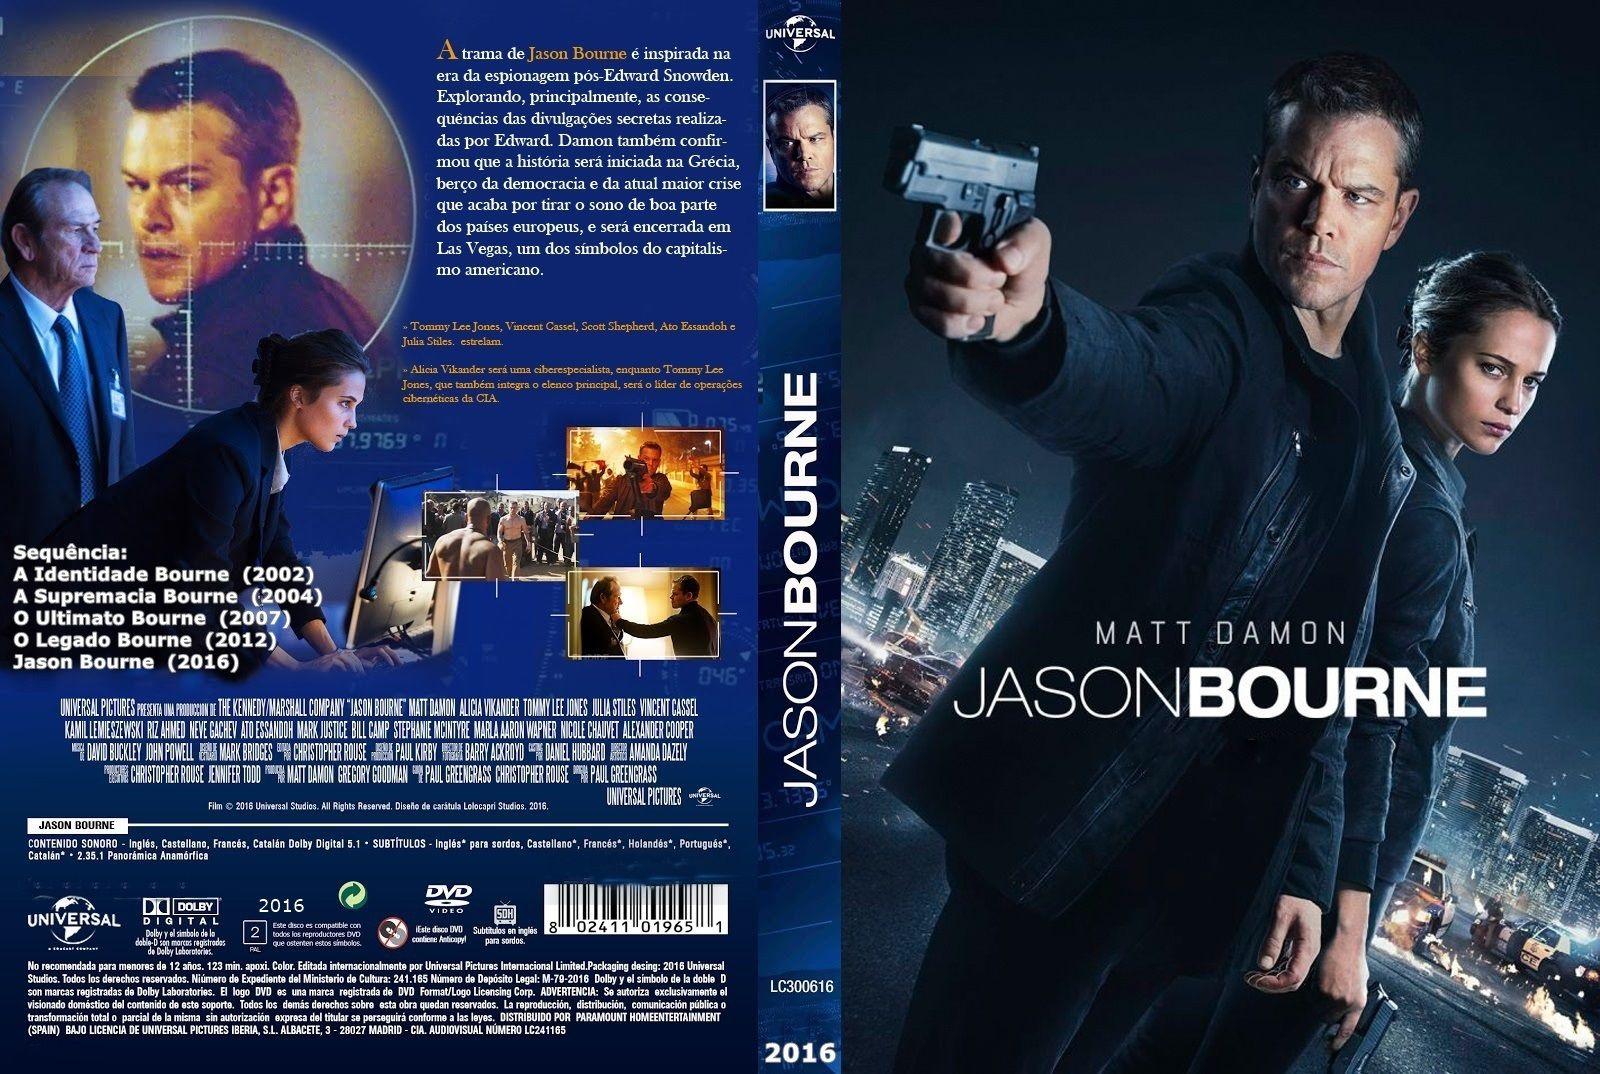 Jason Bourne 2016 Jason Bourne Jason Bourne 2016 Bourne